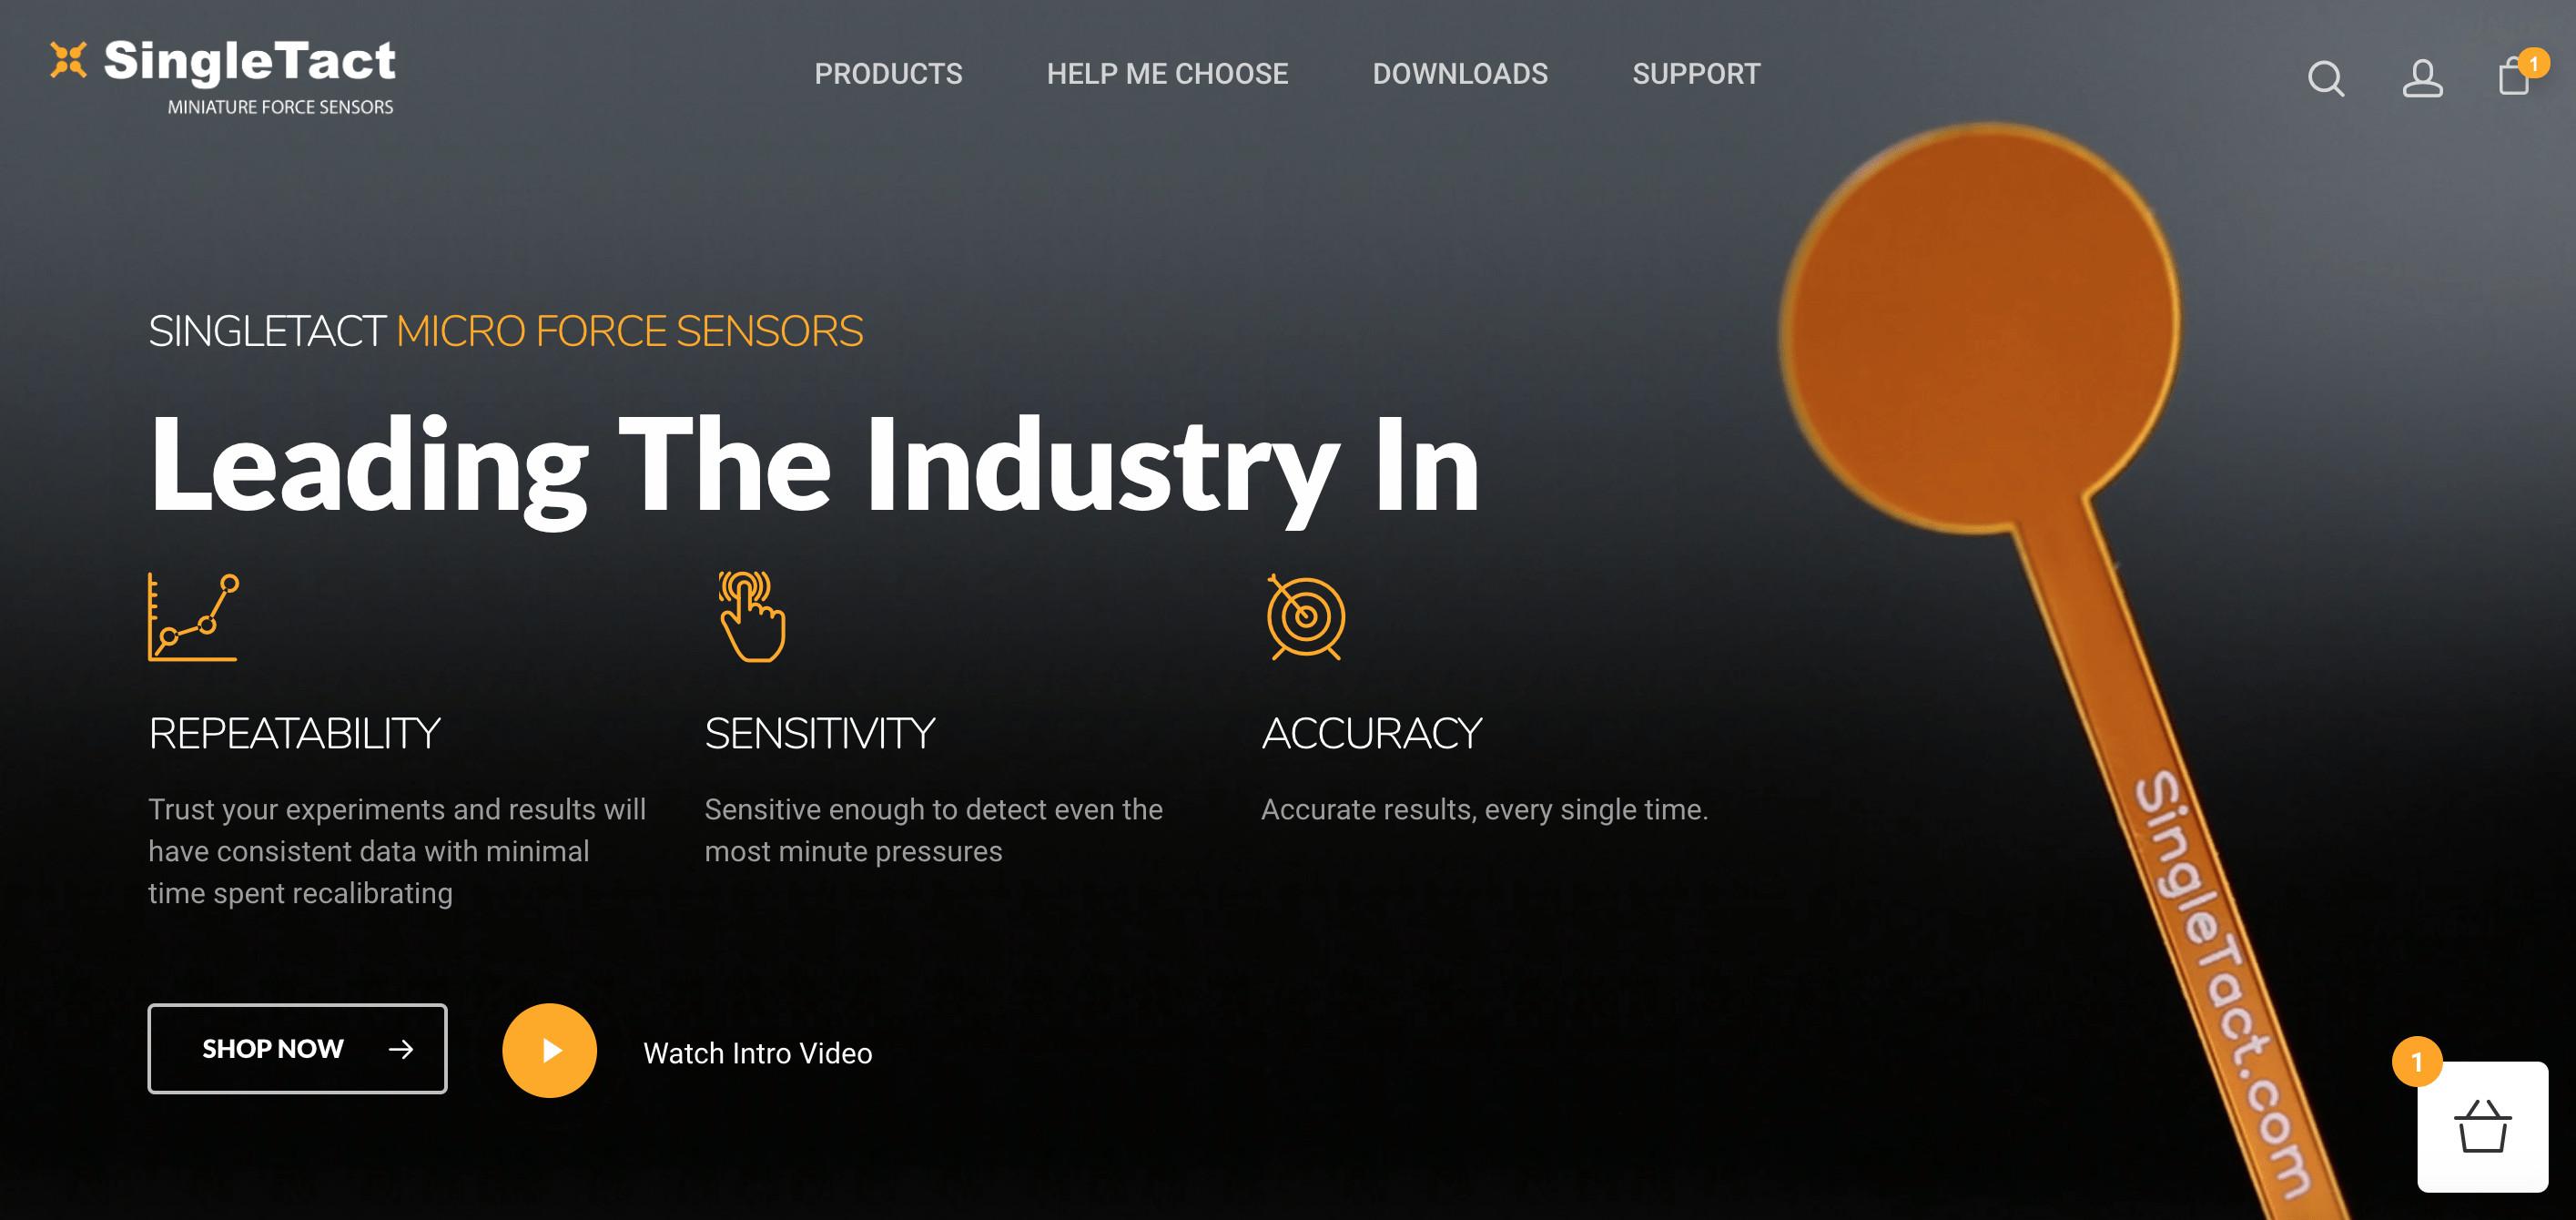 Santa Barbara Web Design - Singletact